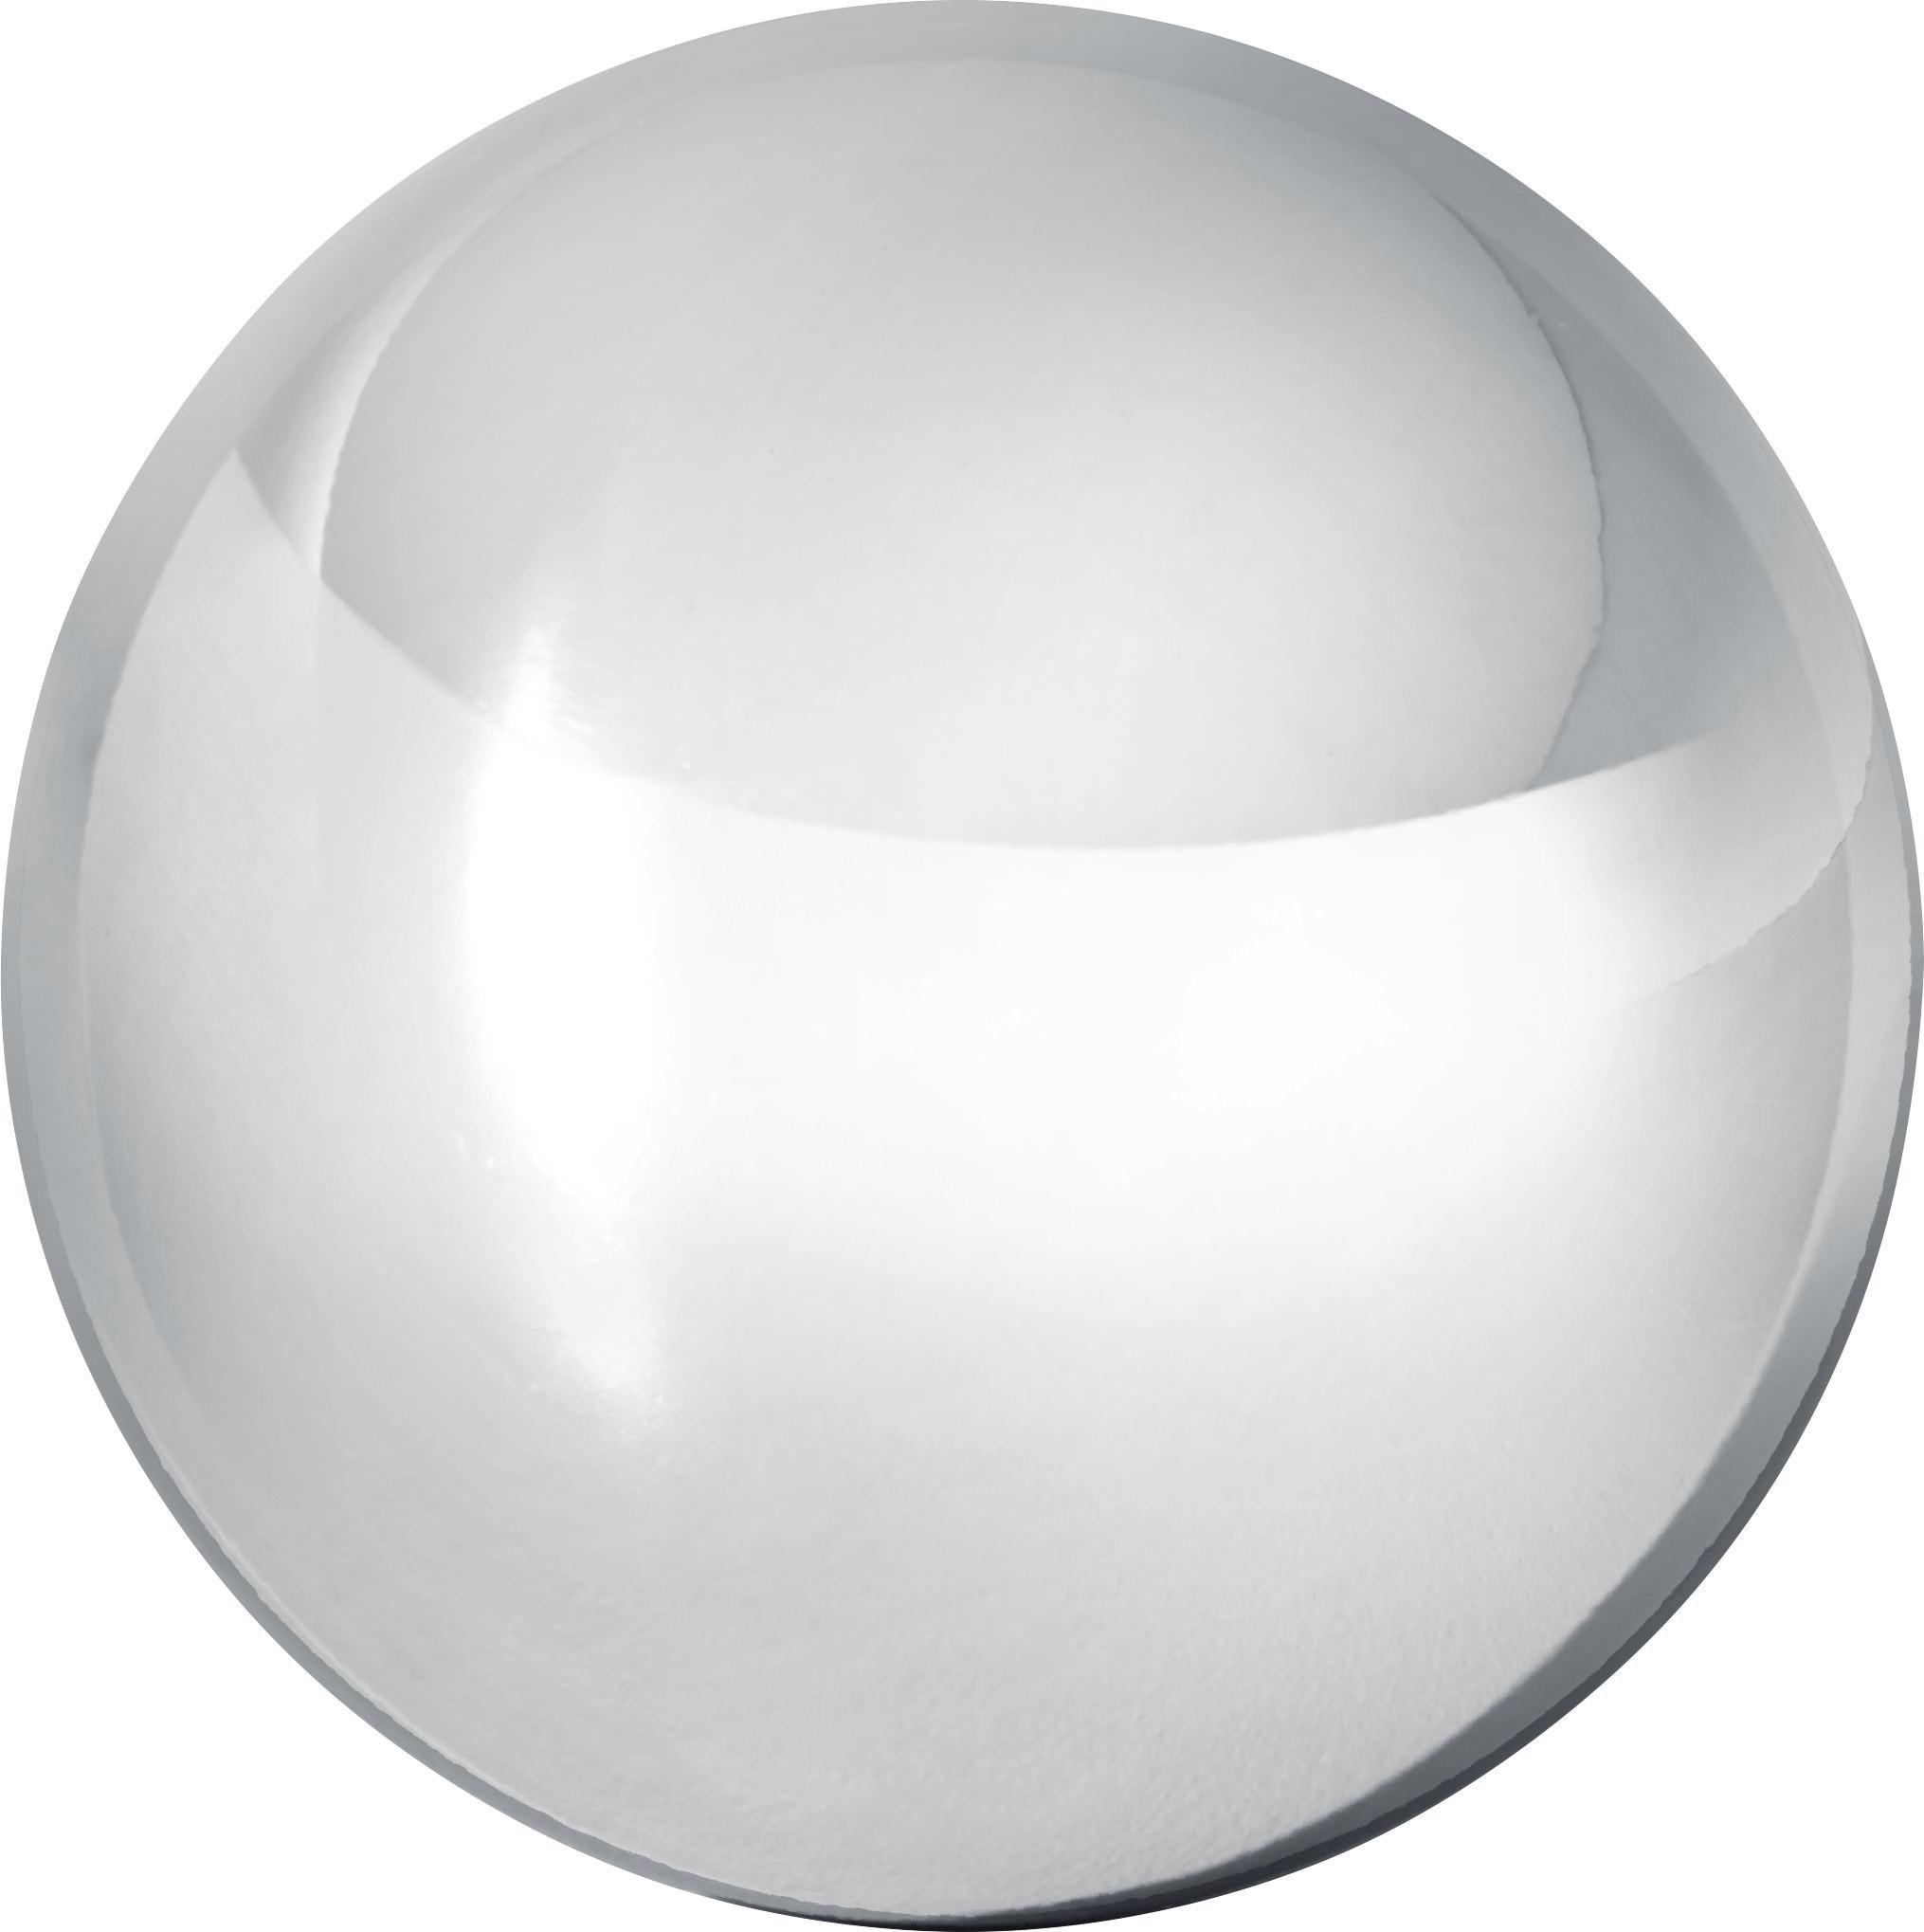 Dekokugel 28 cm Mia - Silberfarben, Metall (28cm) - MÖMAX modern living